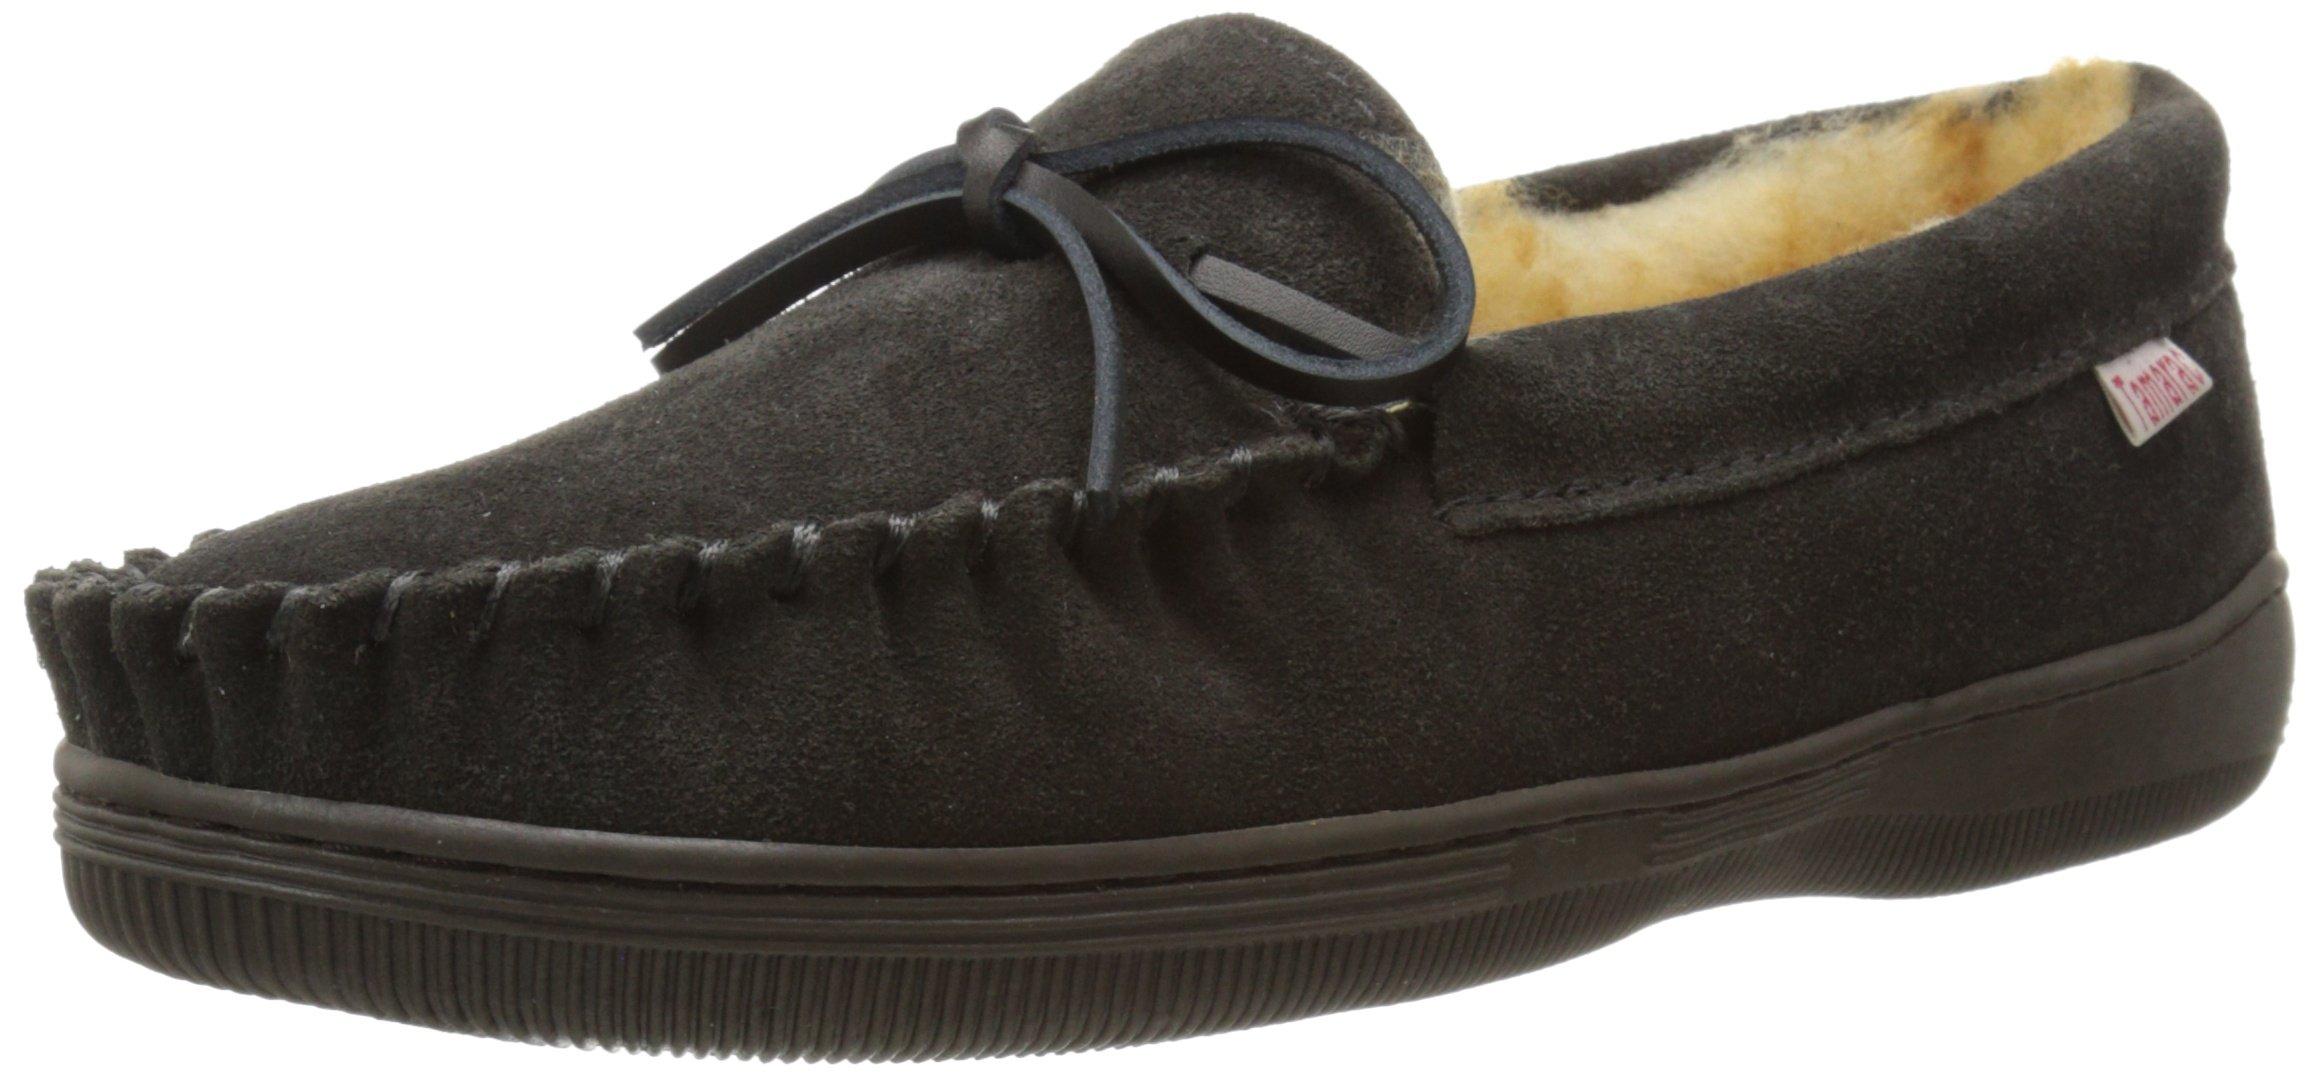 Tamarac by Slippers International Men's Camper Slip-On Loafer, Charcoal Grey, 12 M US